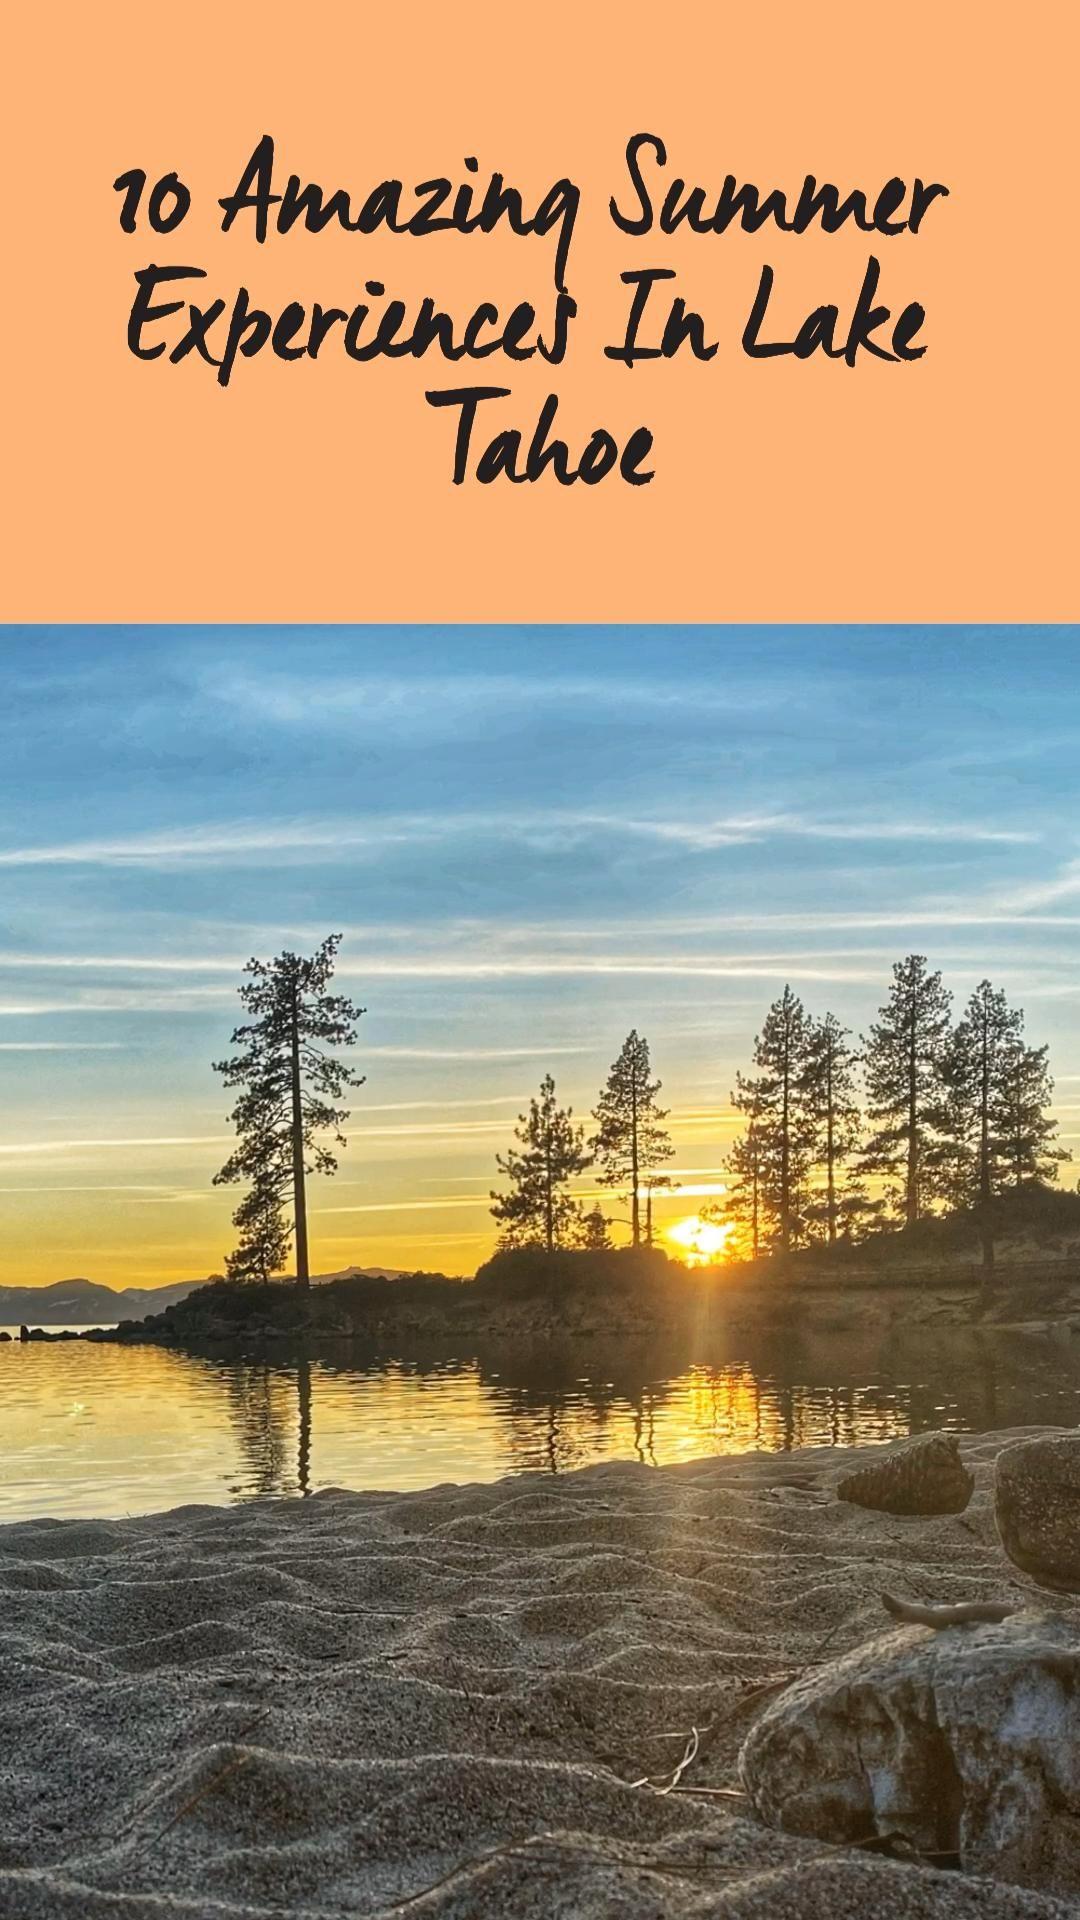 10 Amazing Summer Experiences in Lake Tahoe